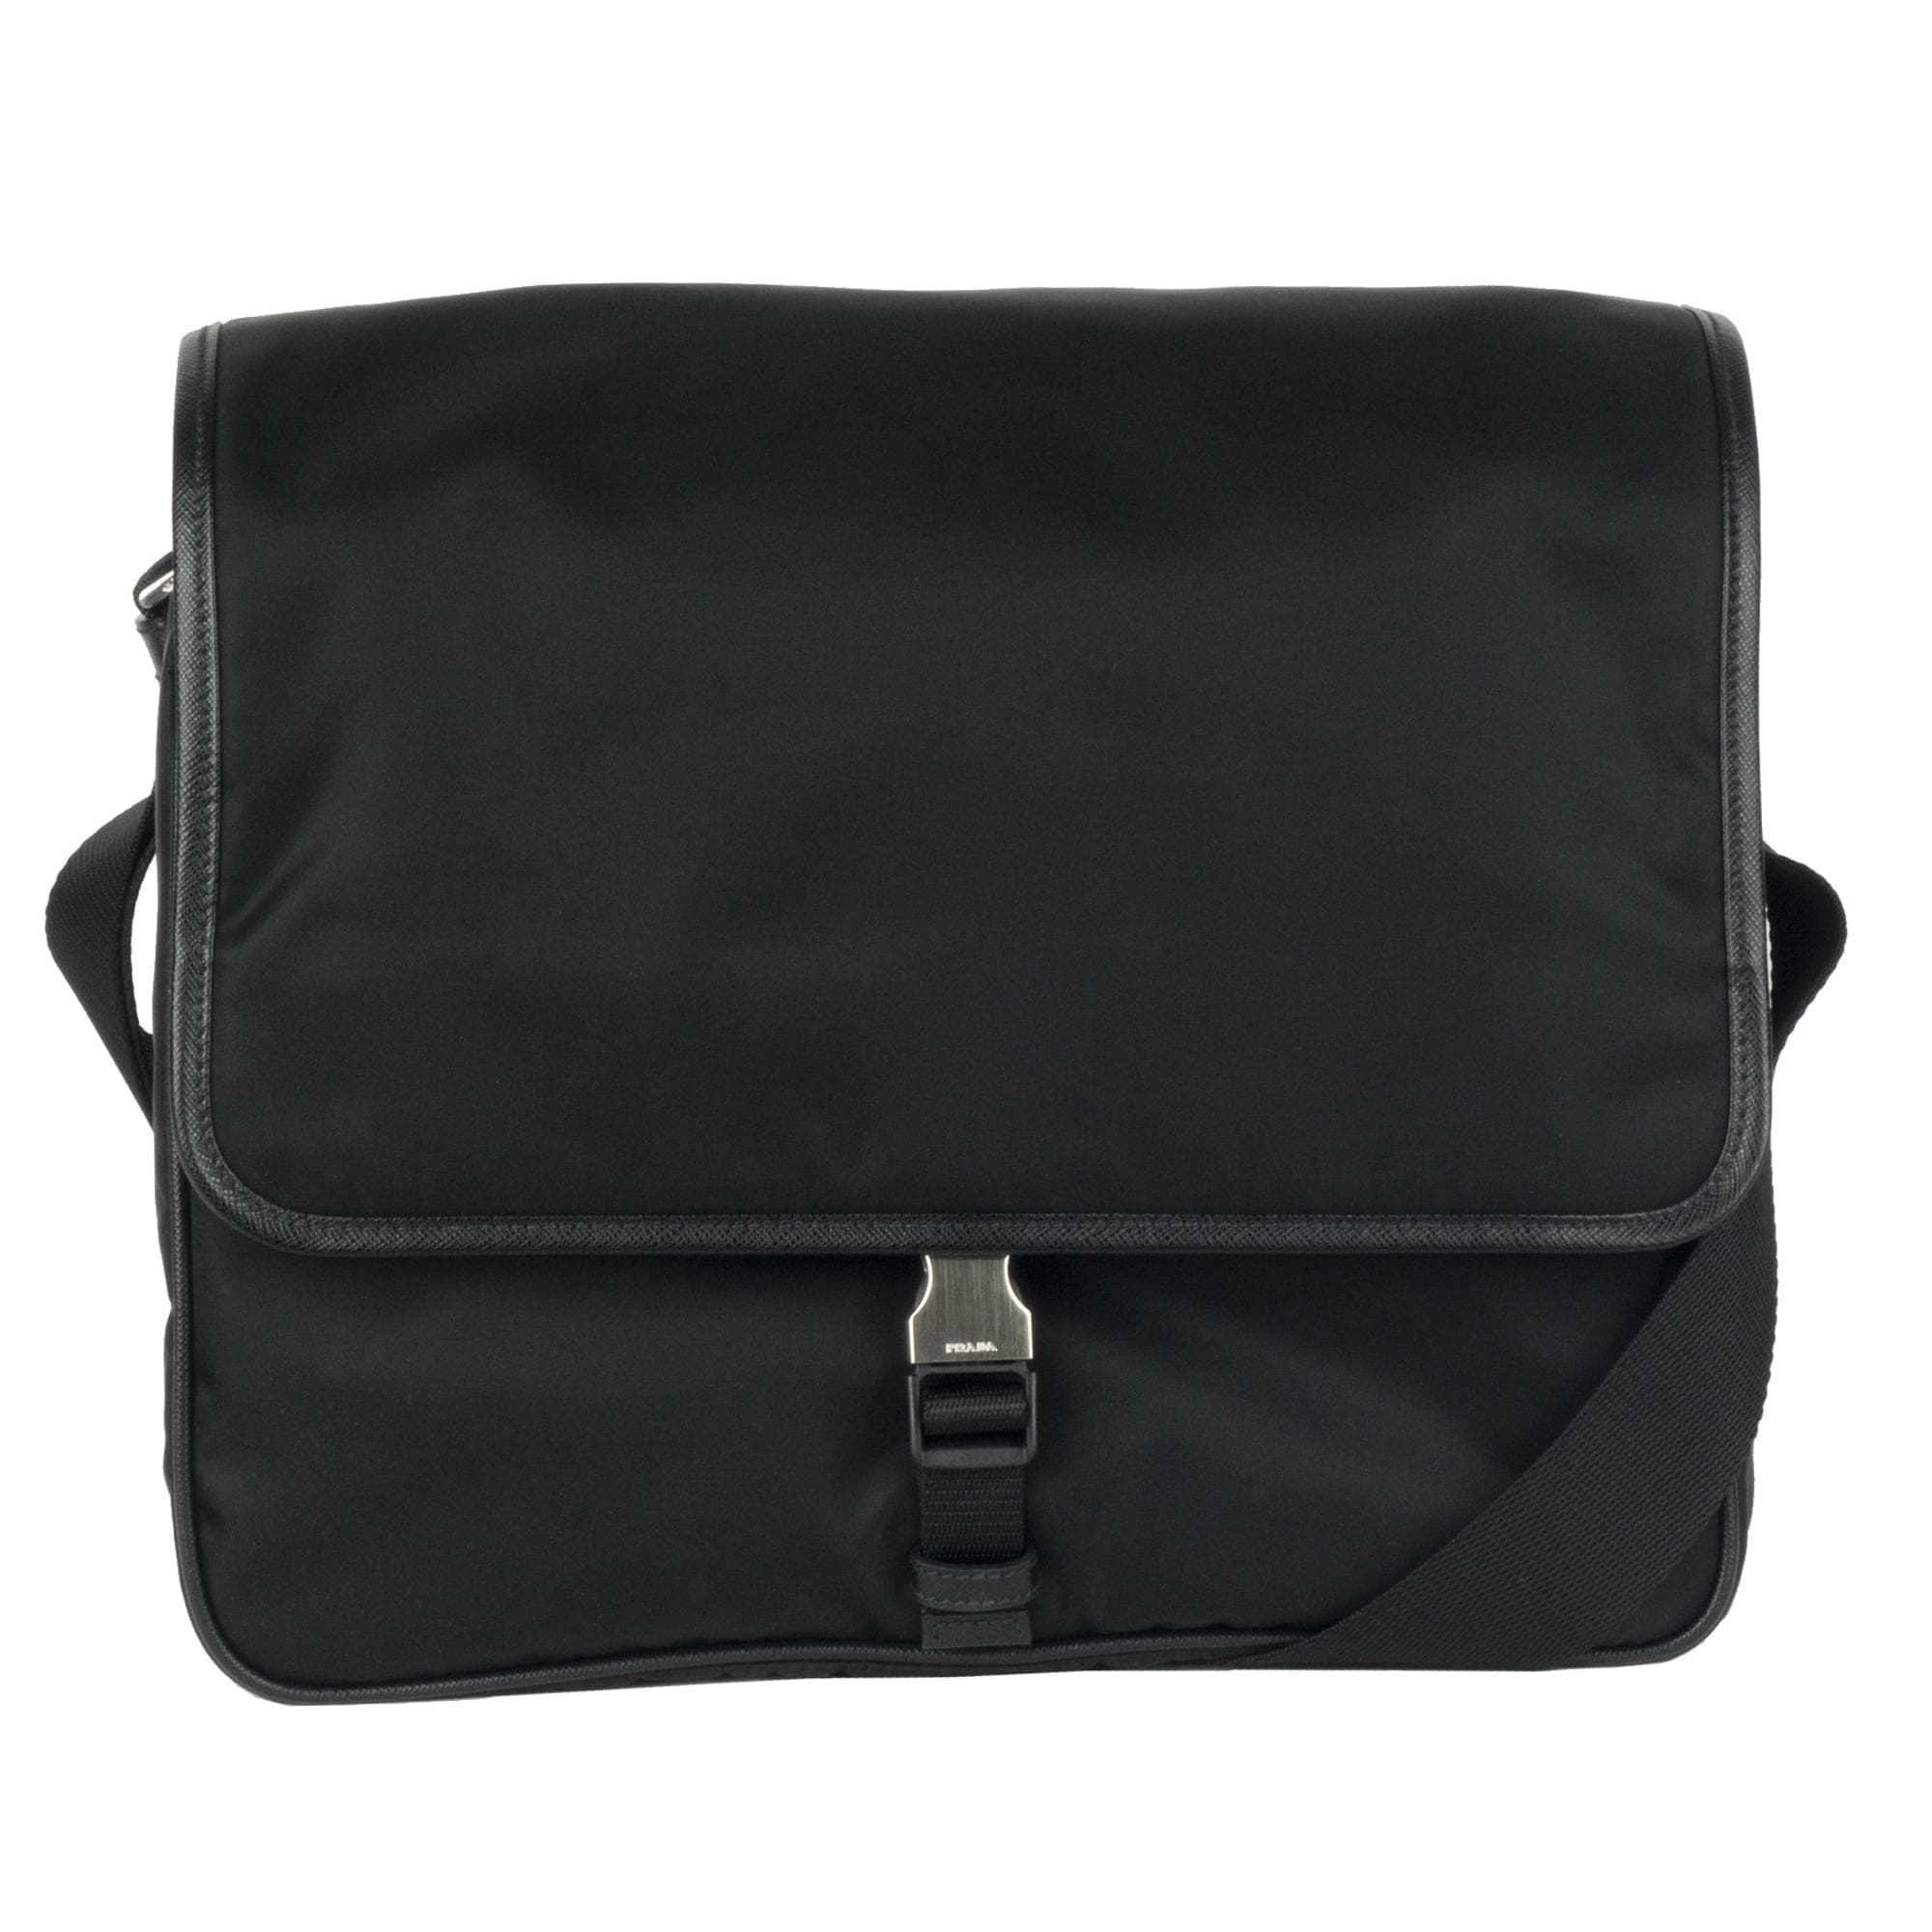 70fdbf7a51cb ... wholesale prada v166 nylon messenger bag 13443427 overstock shopping .  baa8e 1c512